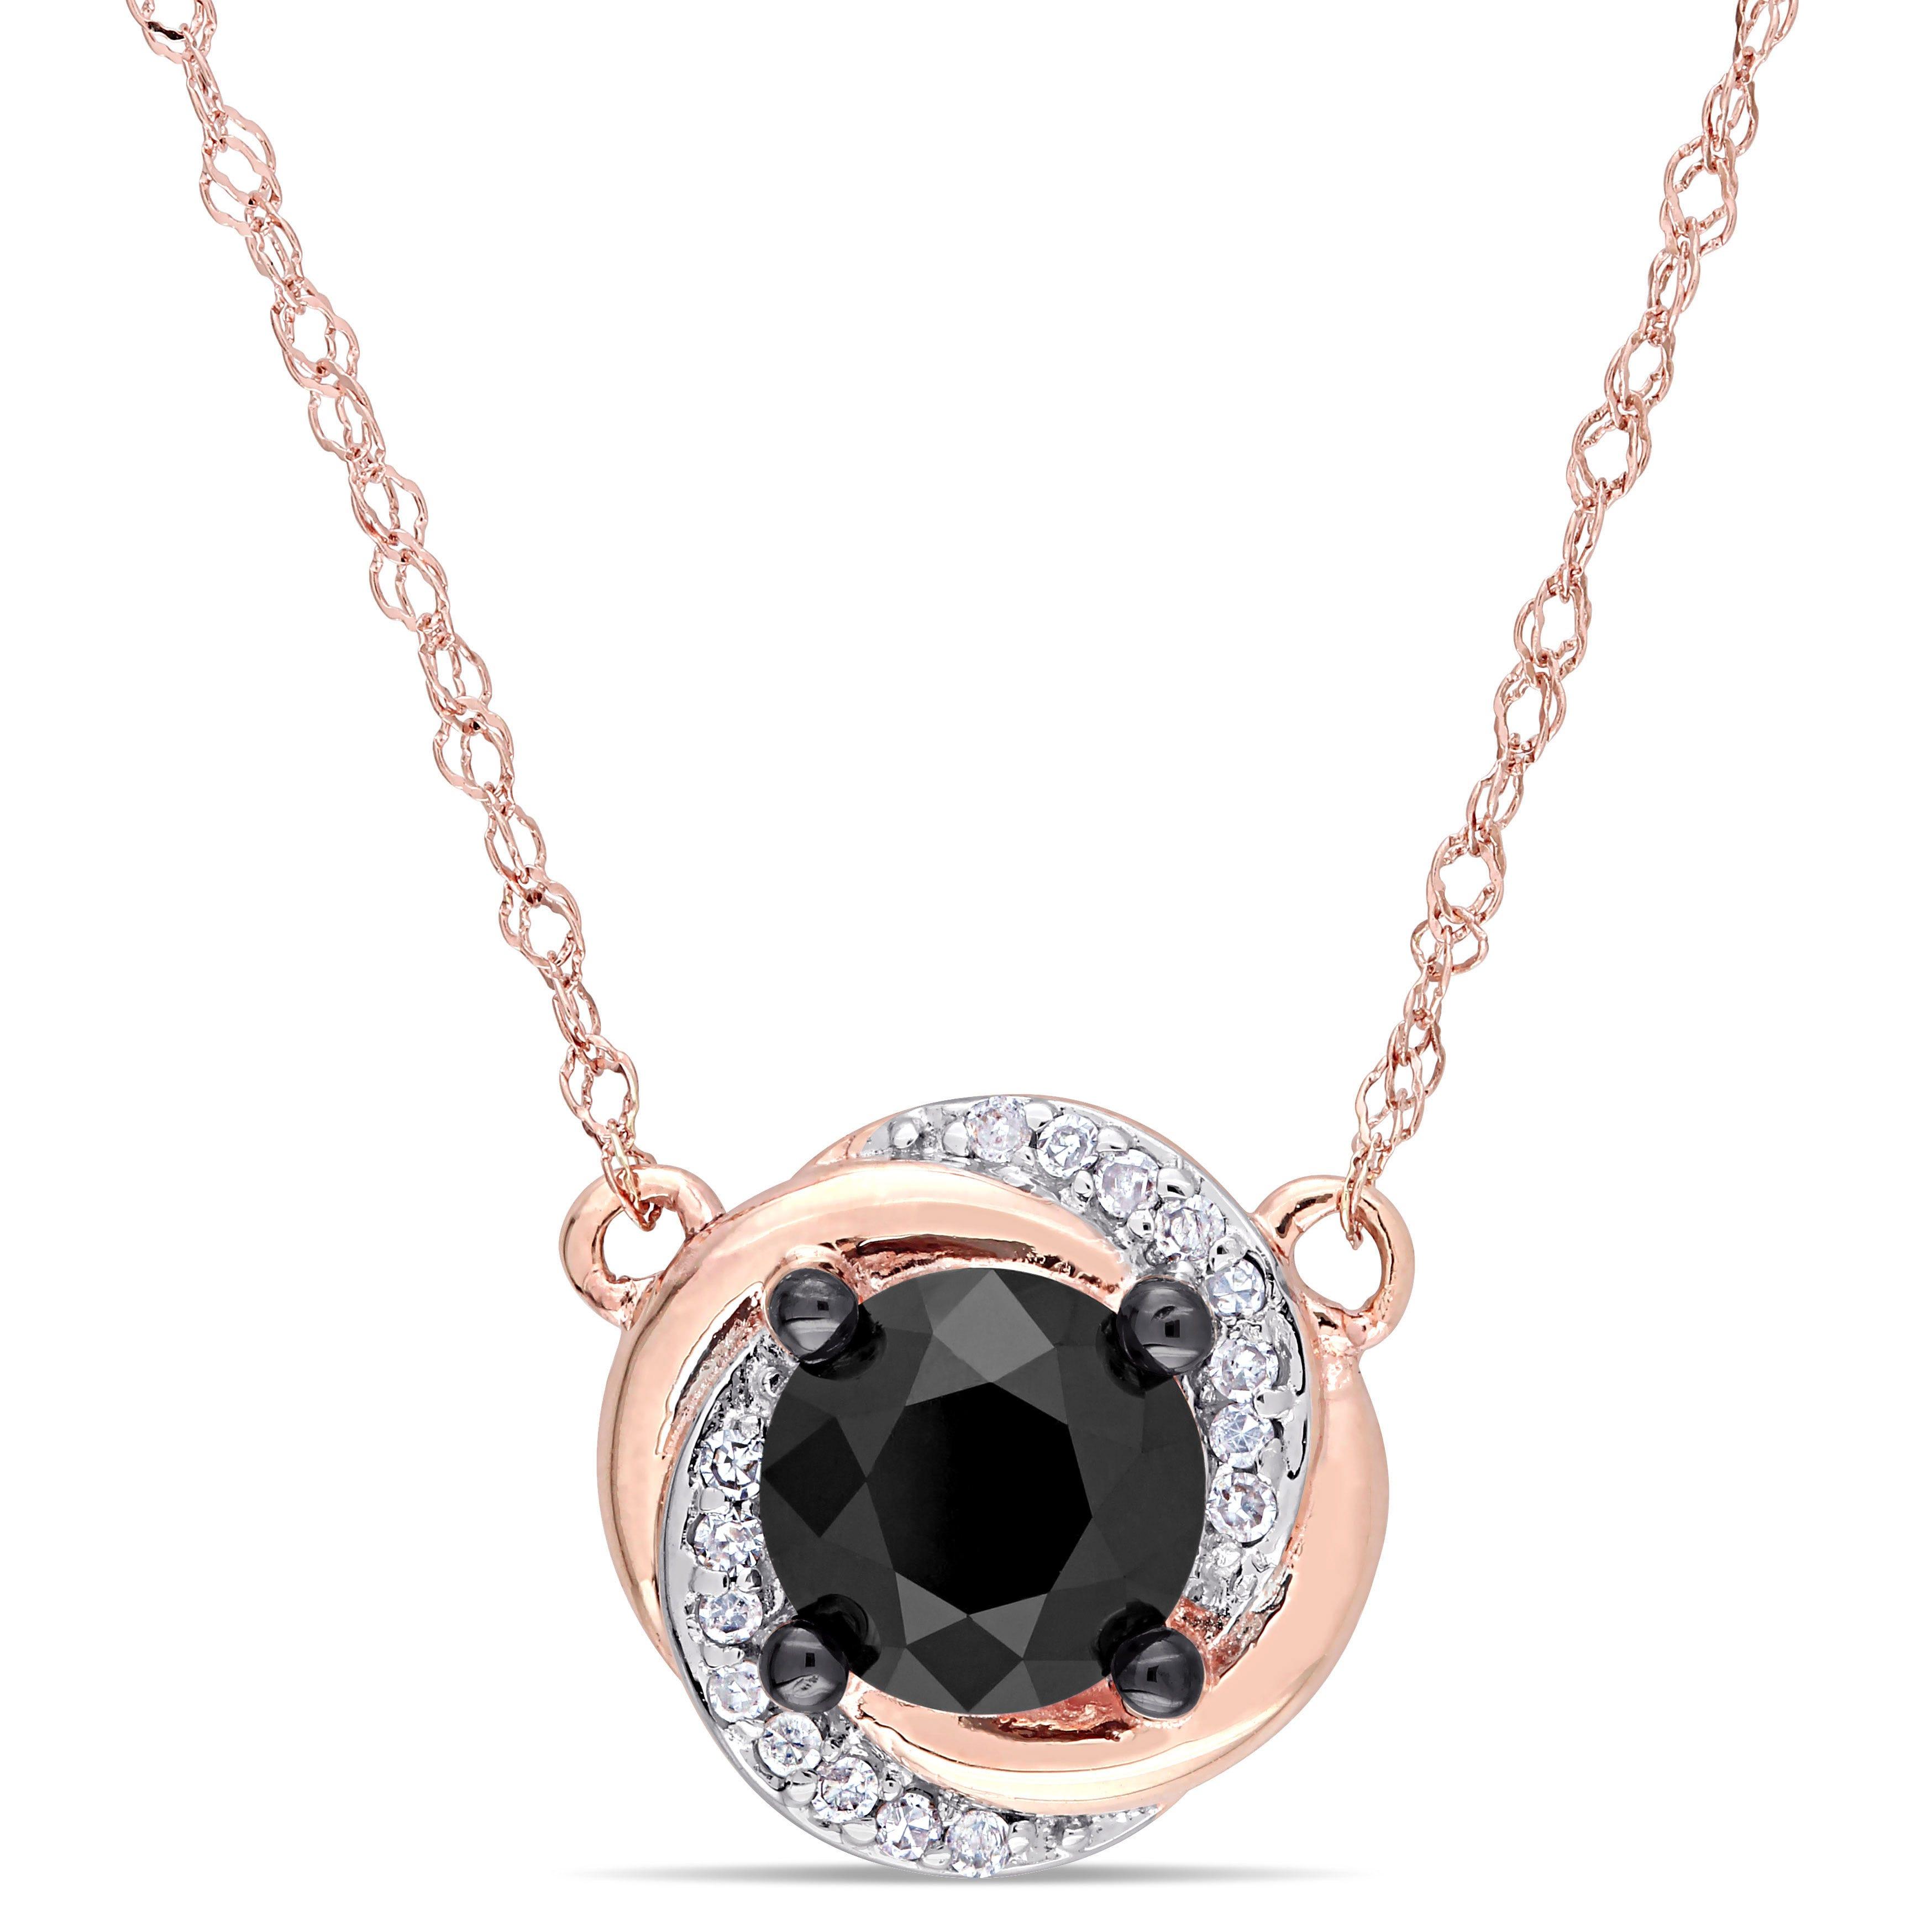 Black & White Diamond Swirl Necklace 1ctw. In 10k Rose Gold